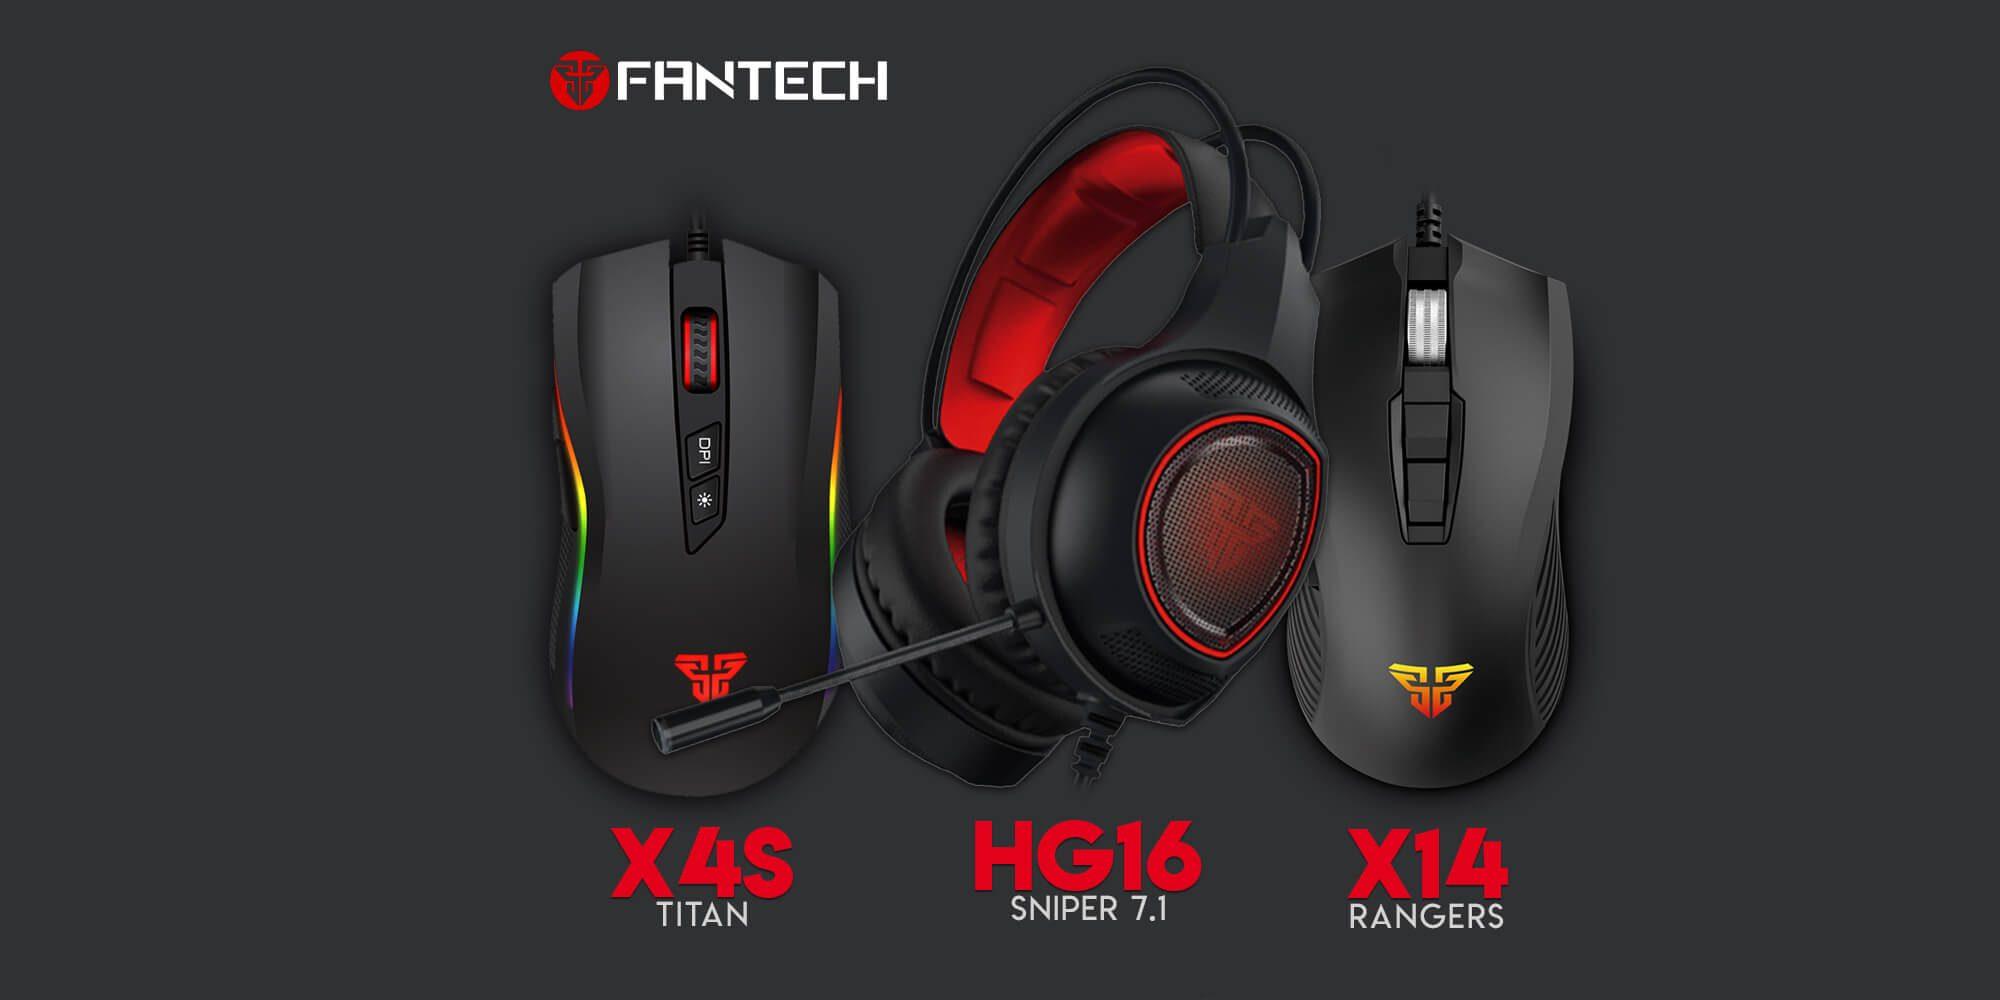 Новинки декабря 2018 - Fantech X4s, X14, HG16